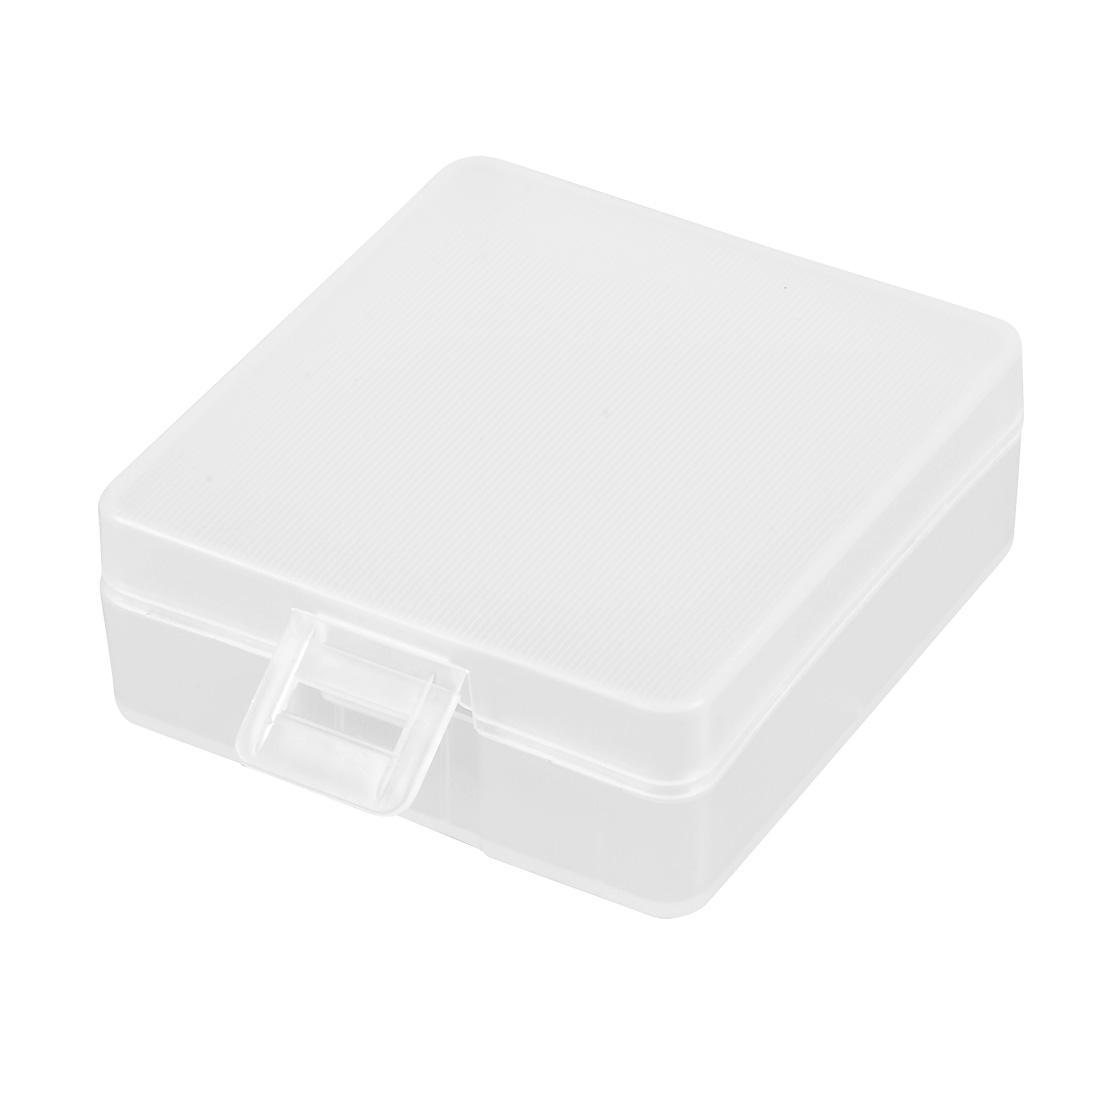 Battery Storage Case Holder Transparent For 2 x 9V Battery Capacity